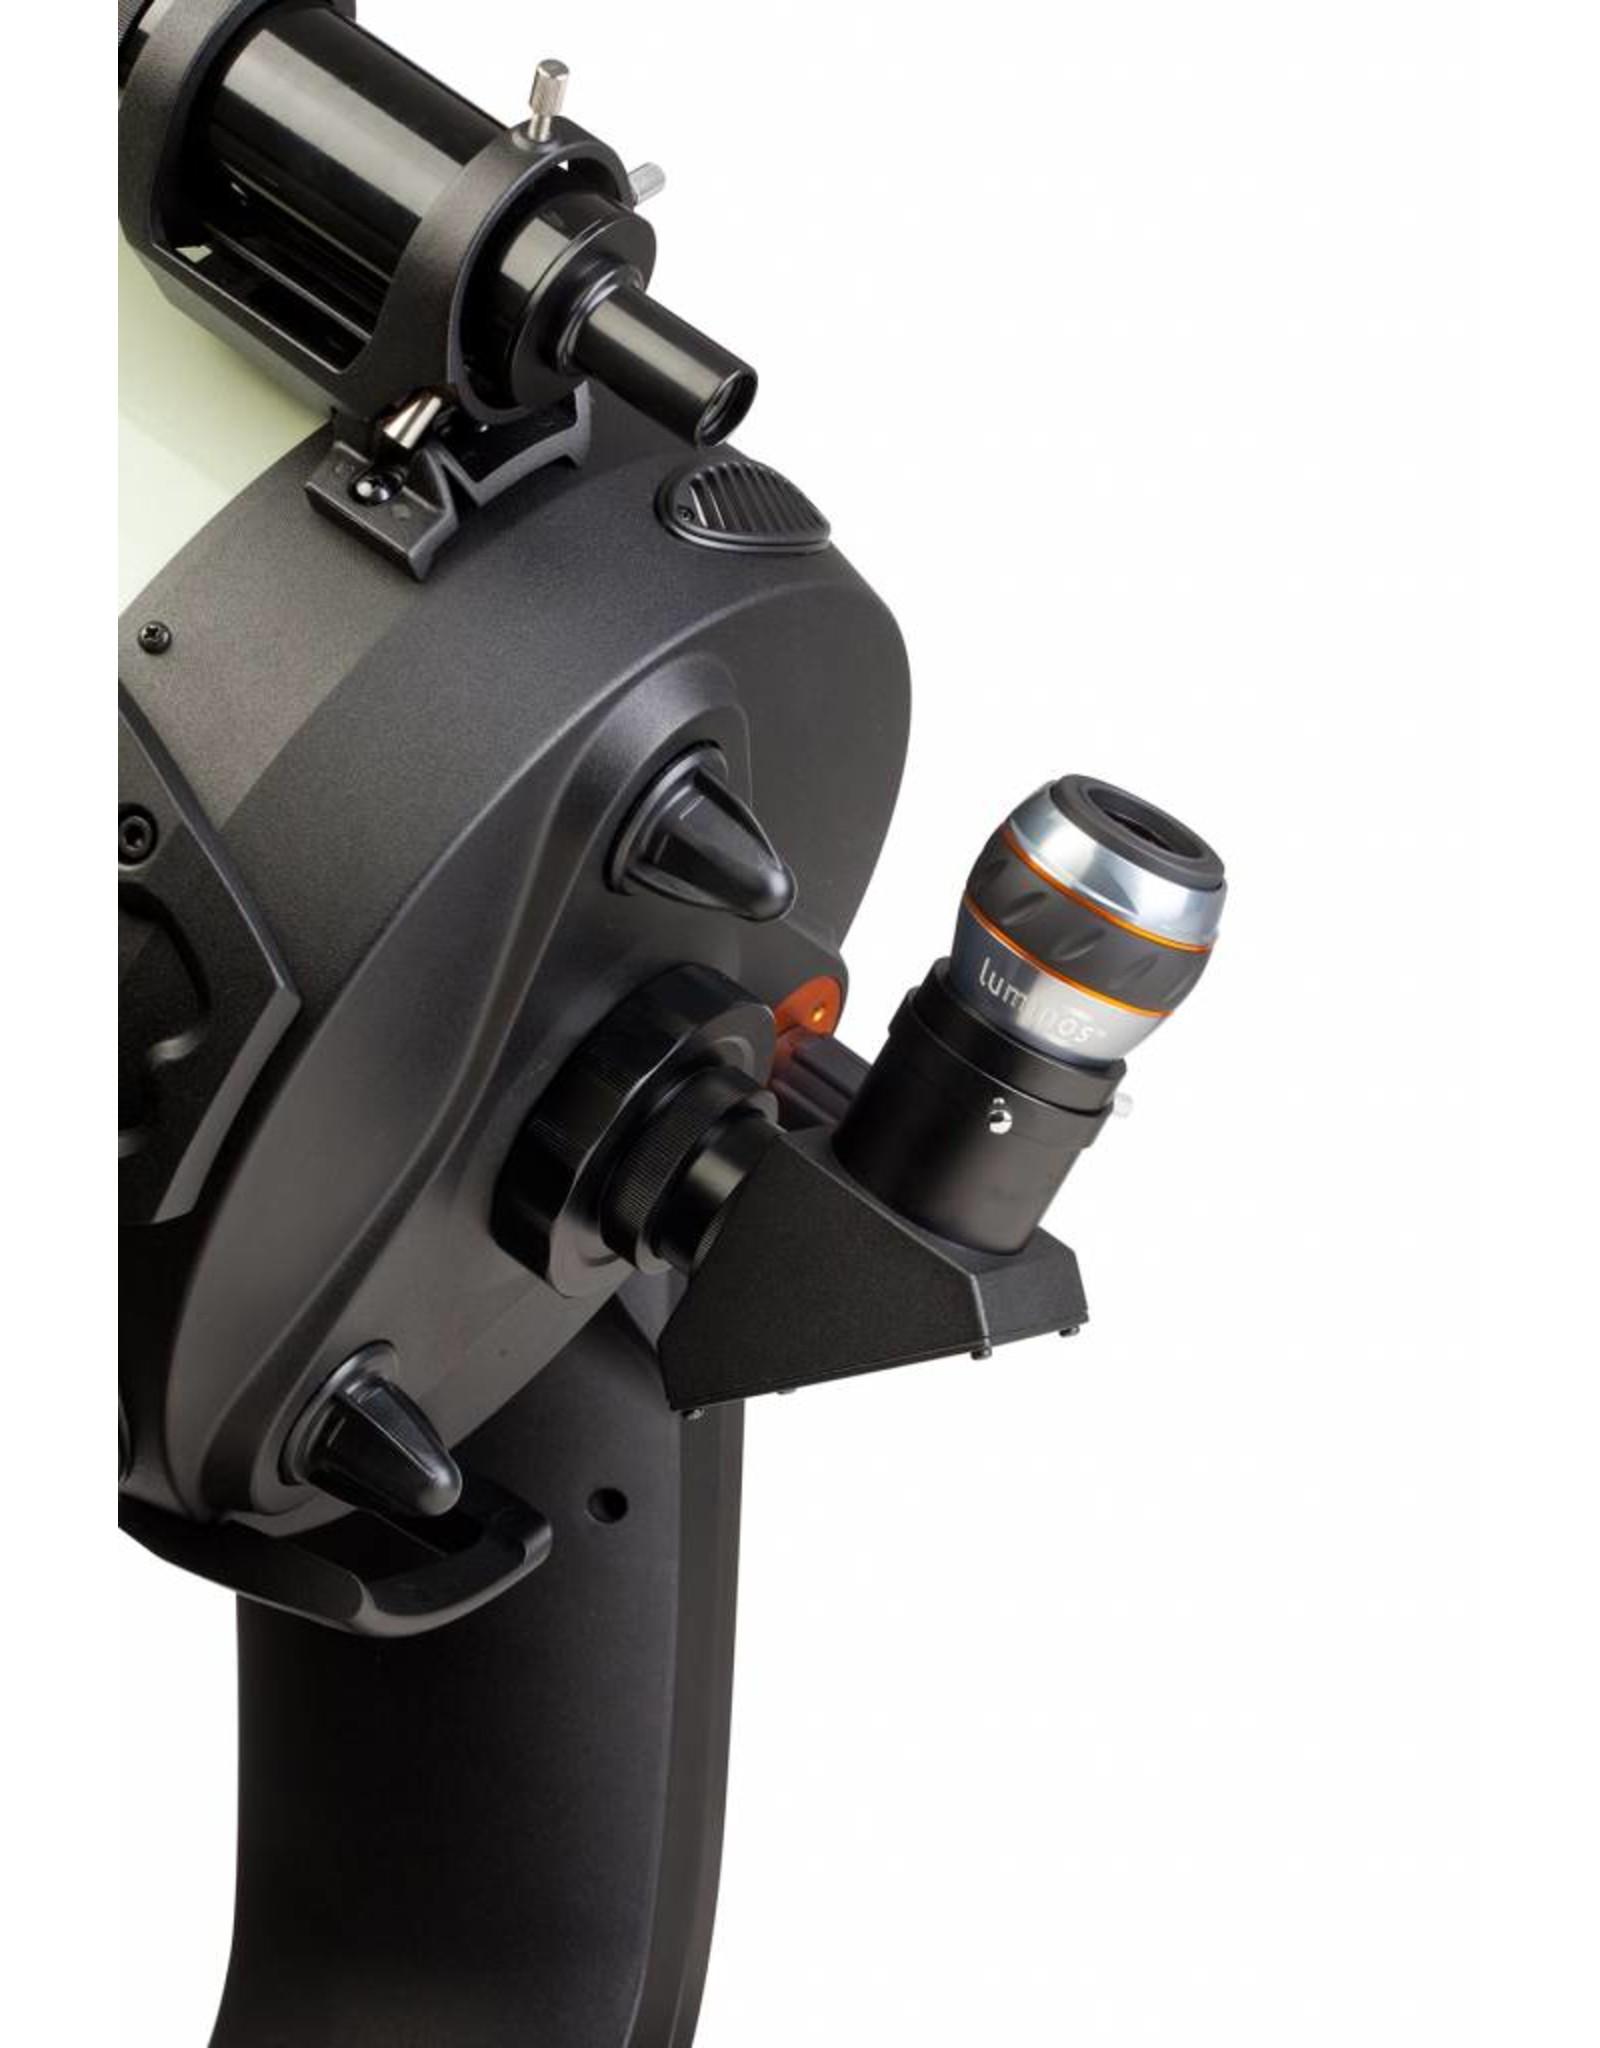 Celestron Celestron Luminos 7mm Eyepiece 1.25 inch